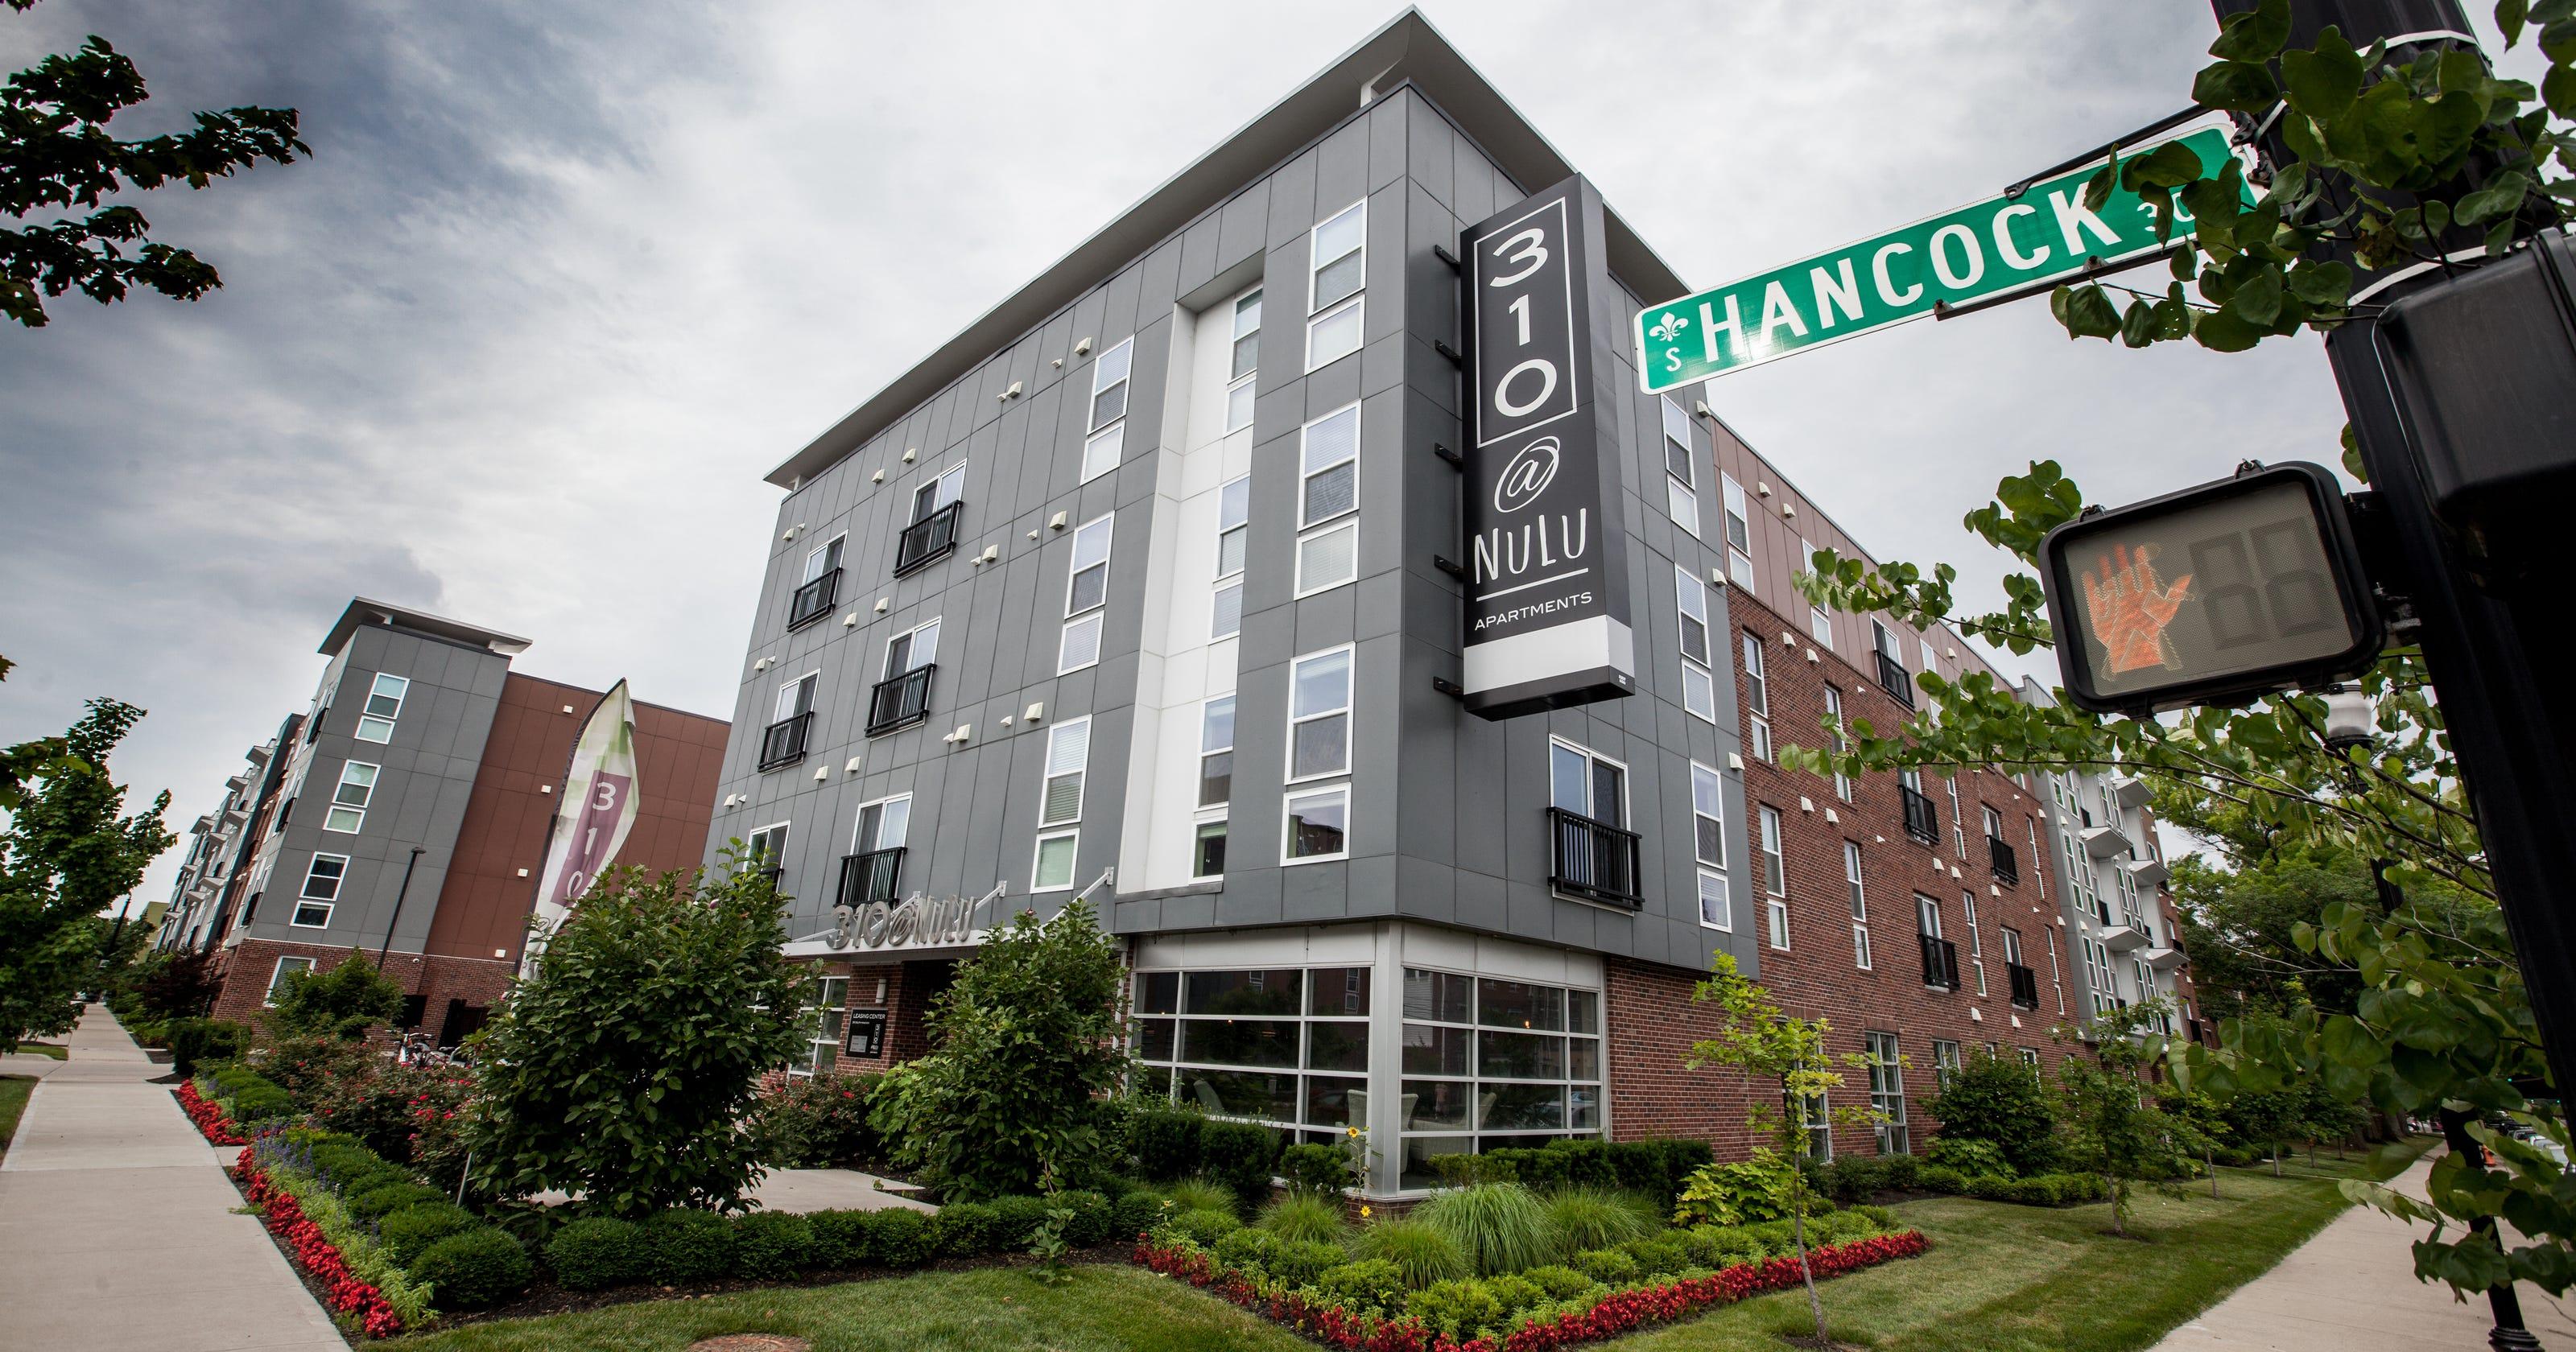 Single Floor Apartments In Louisville Ky Viewfloor Co